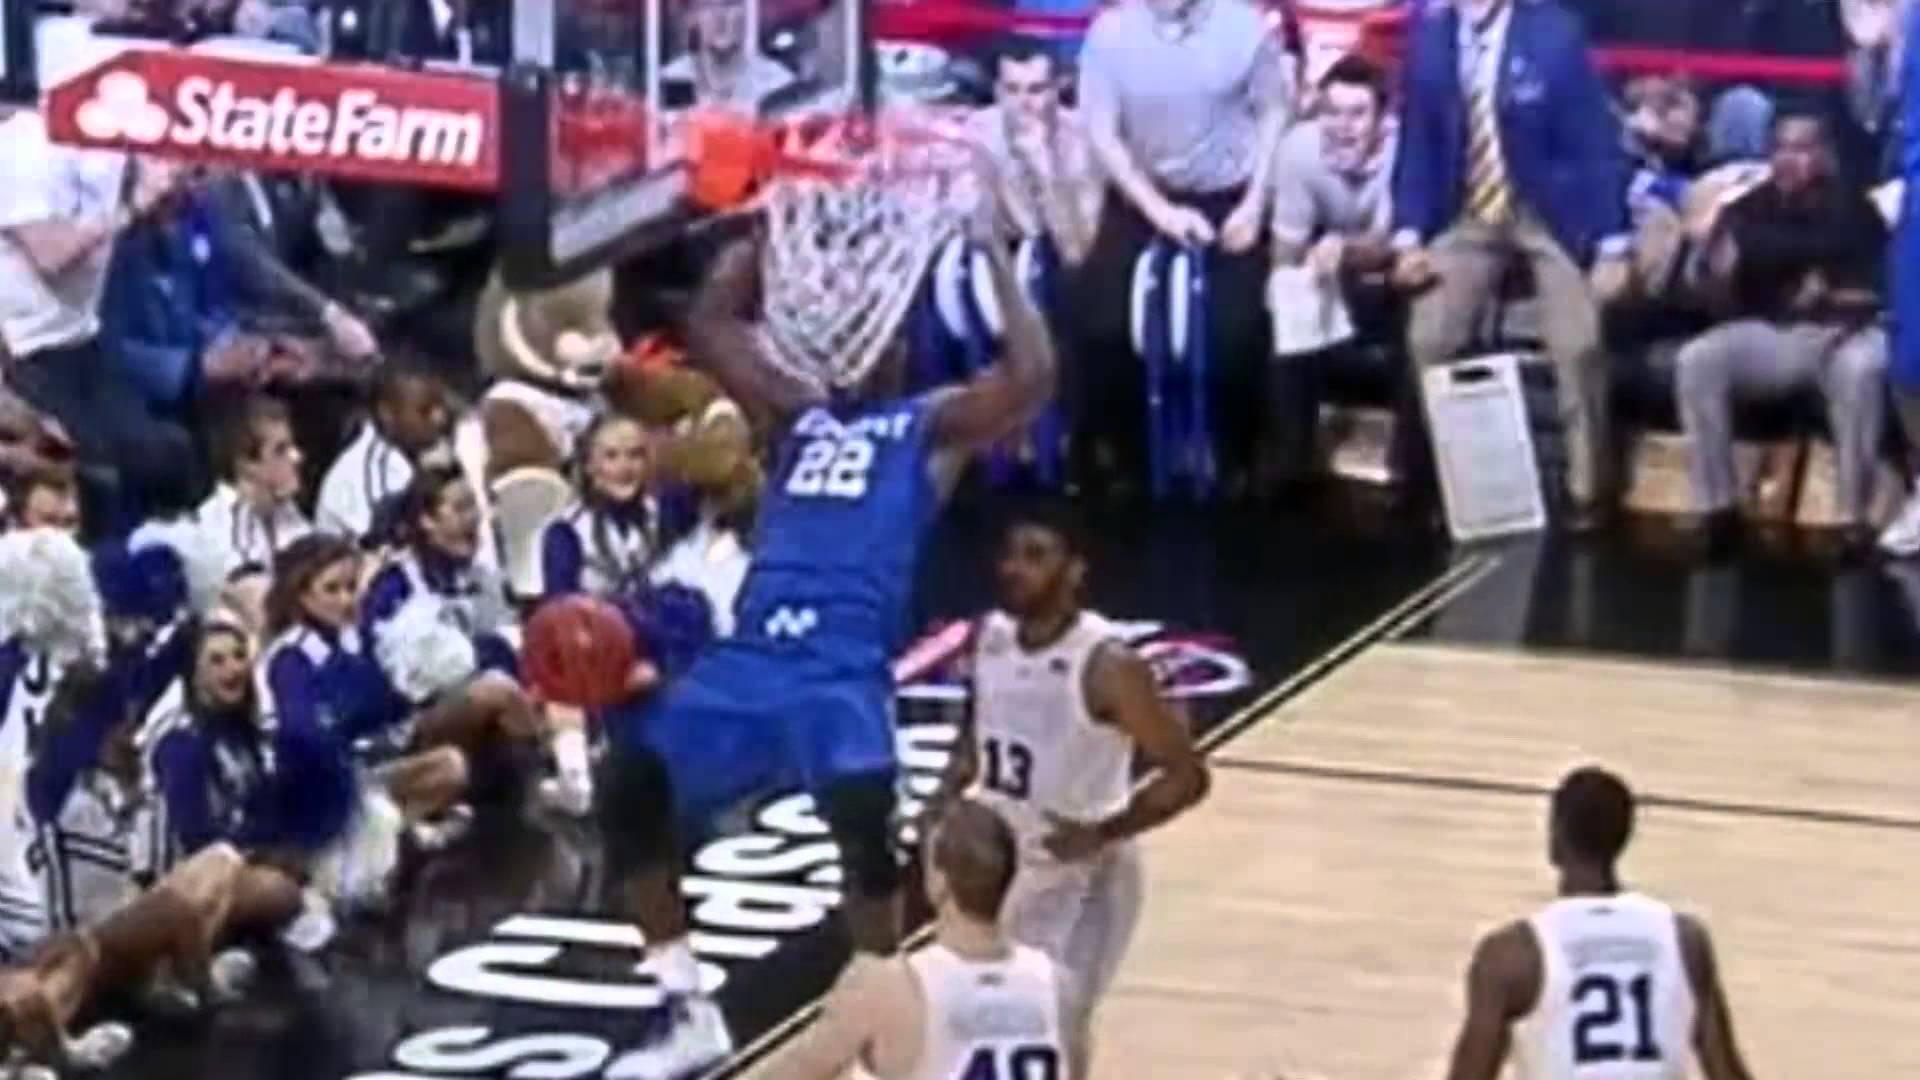 Kentucky basketball player Alex Poythress gets his teeth stuck in the net